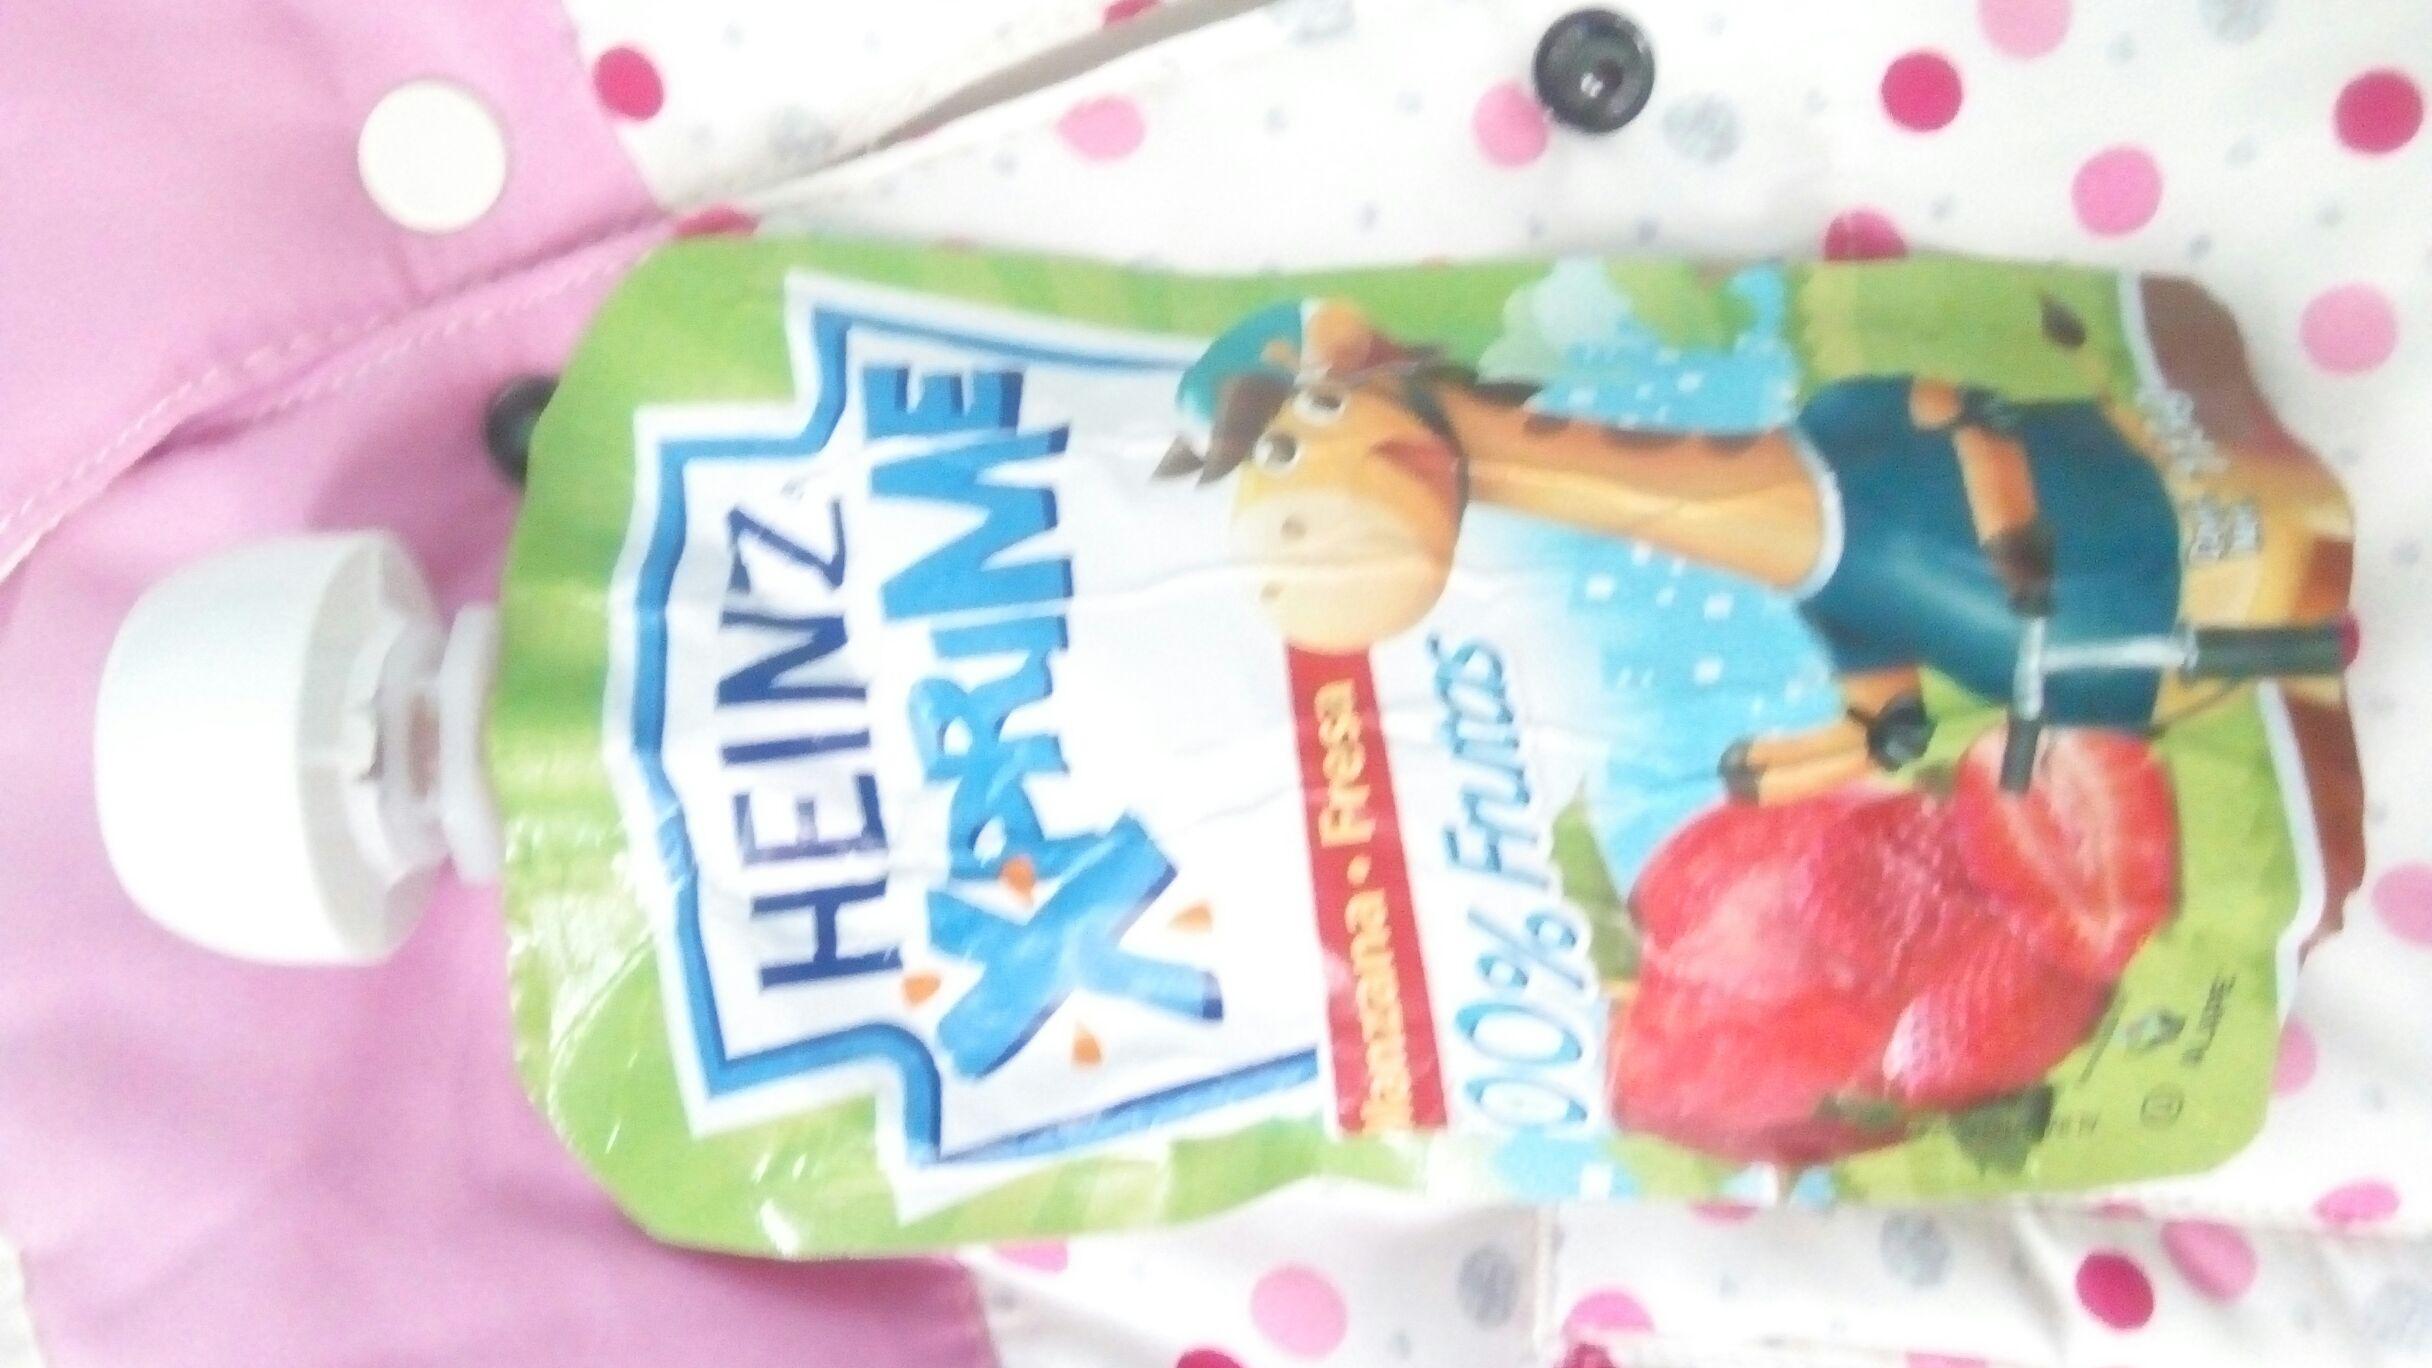 Bodega Aurrerá: Heinz papilla Xprime Fresa-Manzana $5.02 y Chaleco Minnie $120.03